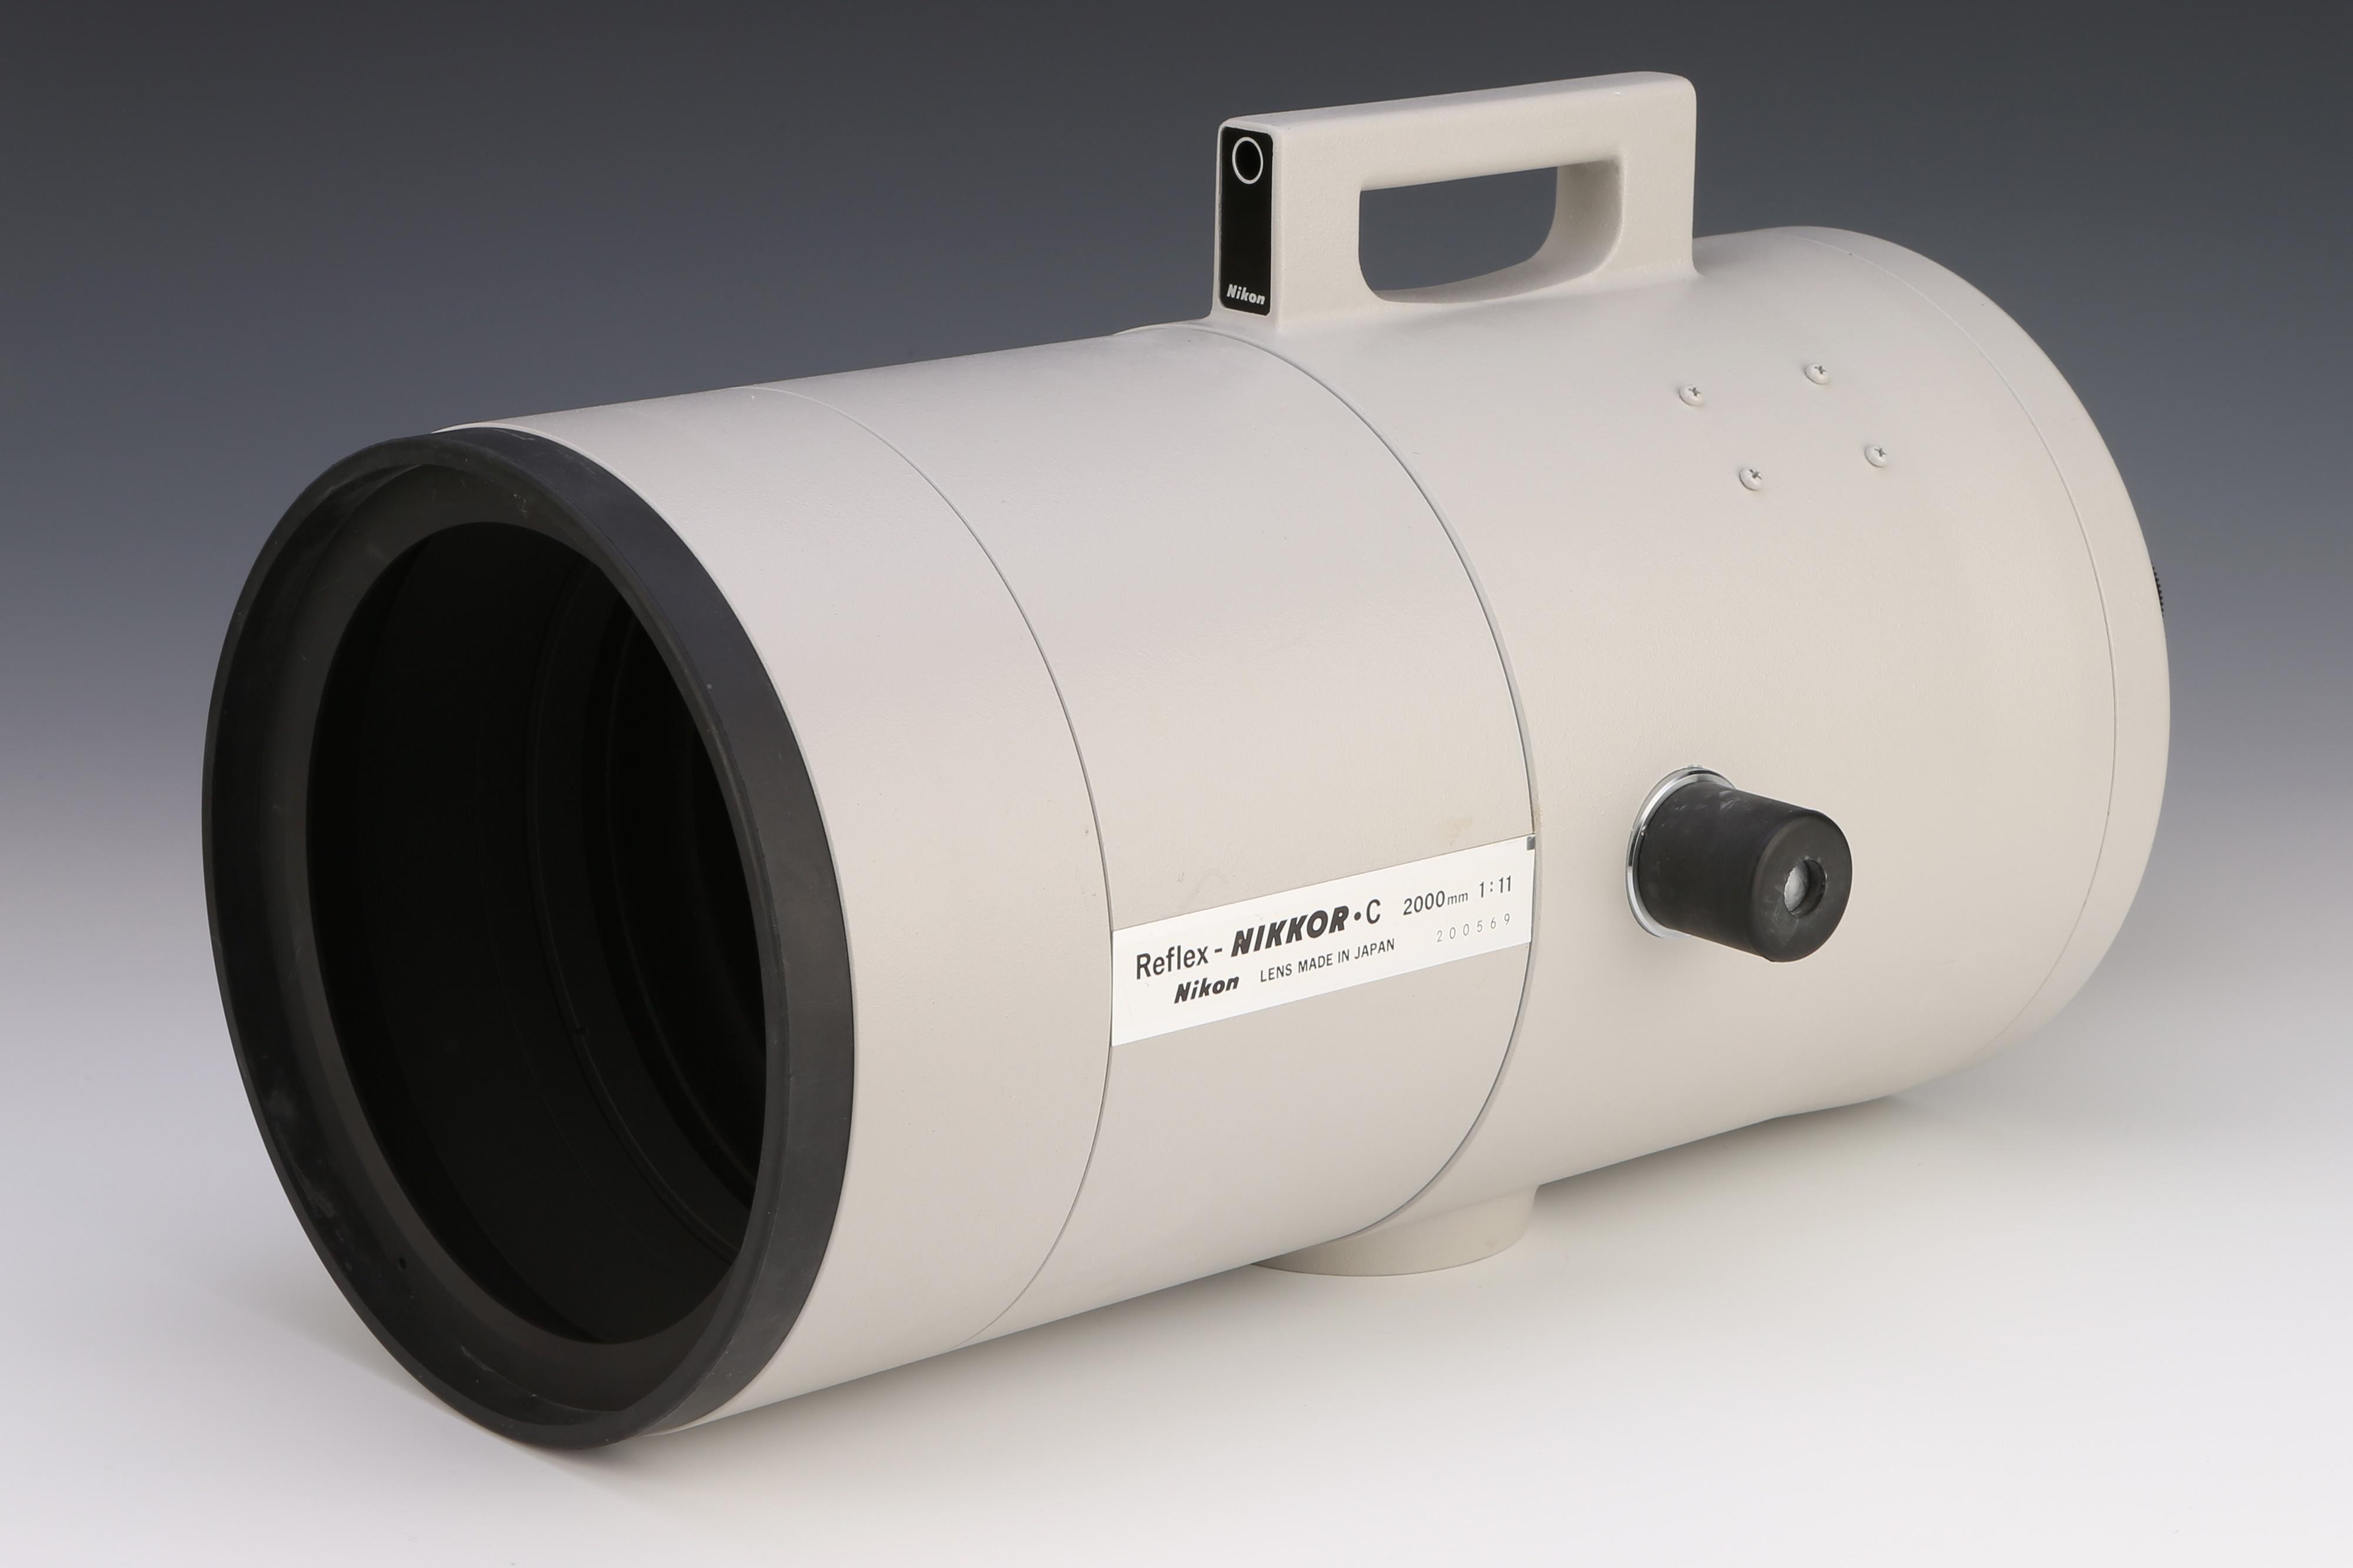 Reflex-Nikkor 2000mm f11 lens (Pic: Flints Auctions)